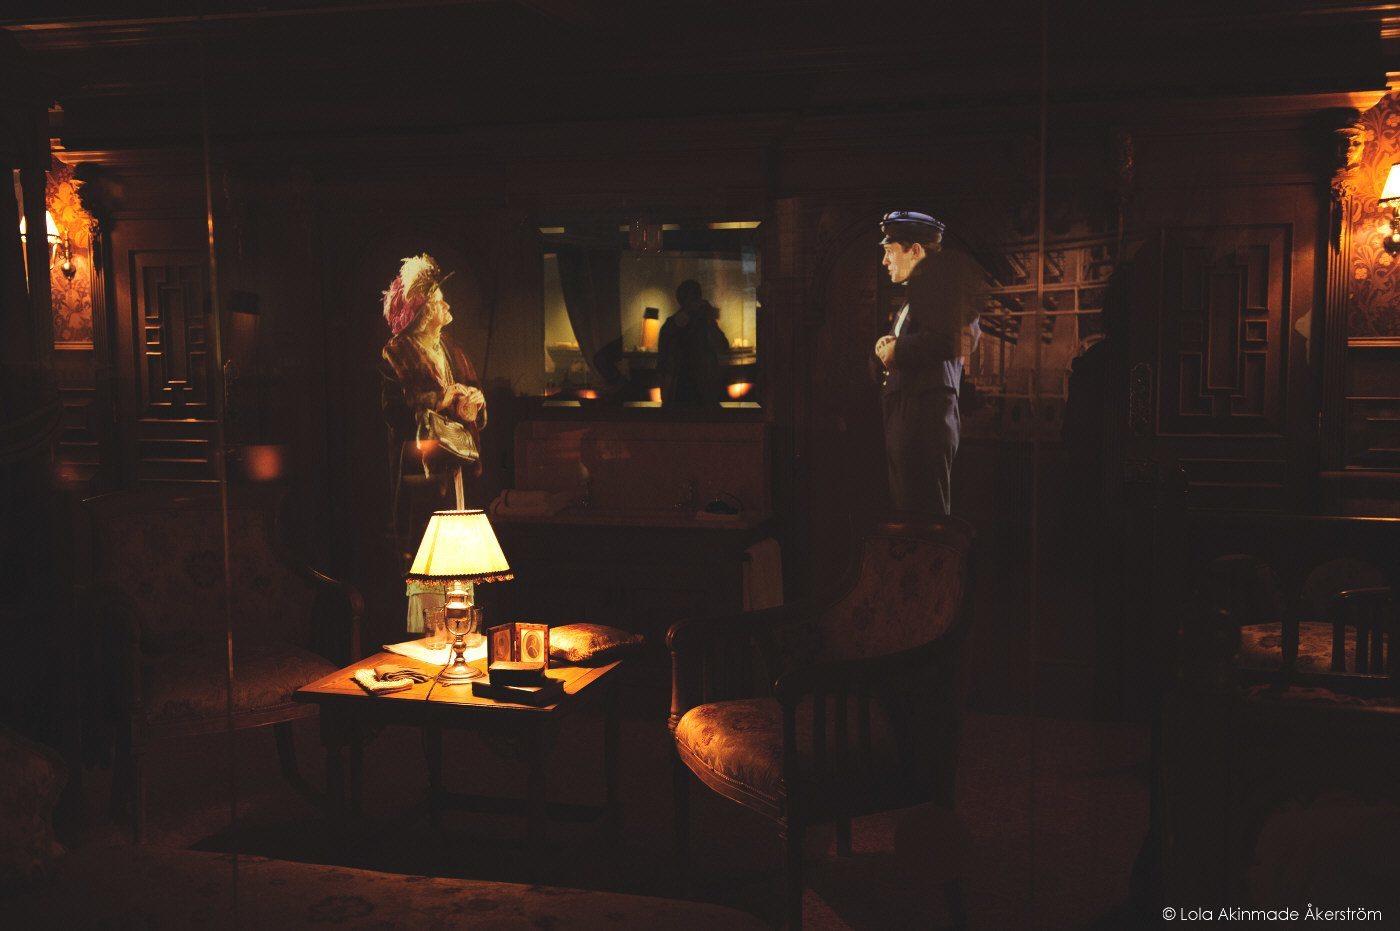 Titanic Belfast, Northern Ireland - Lola Akinmade Akerstrom